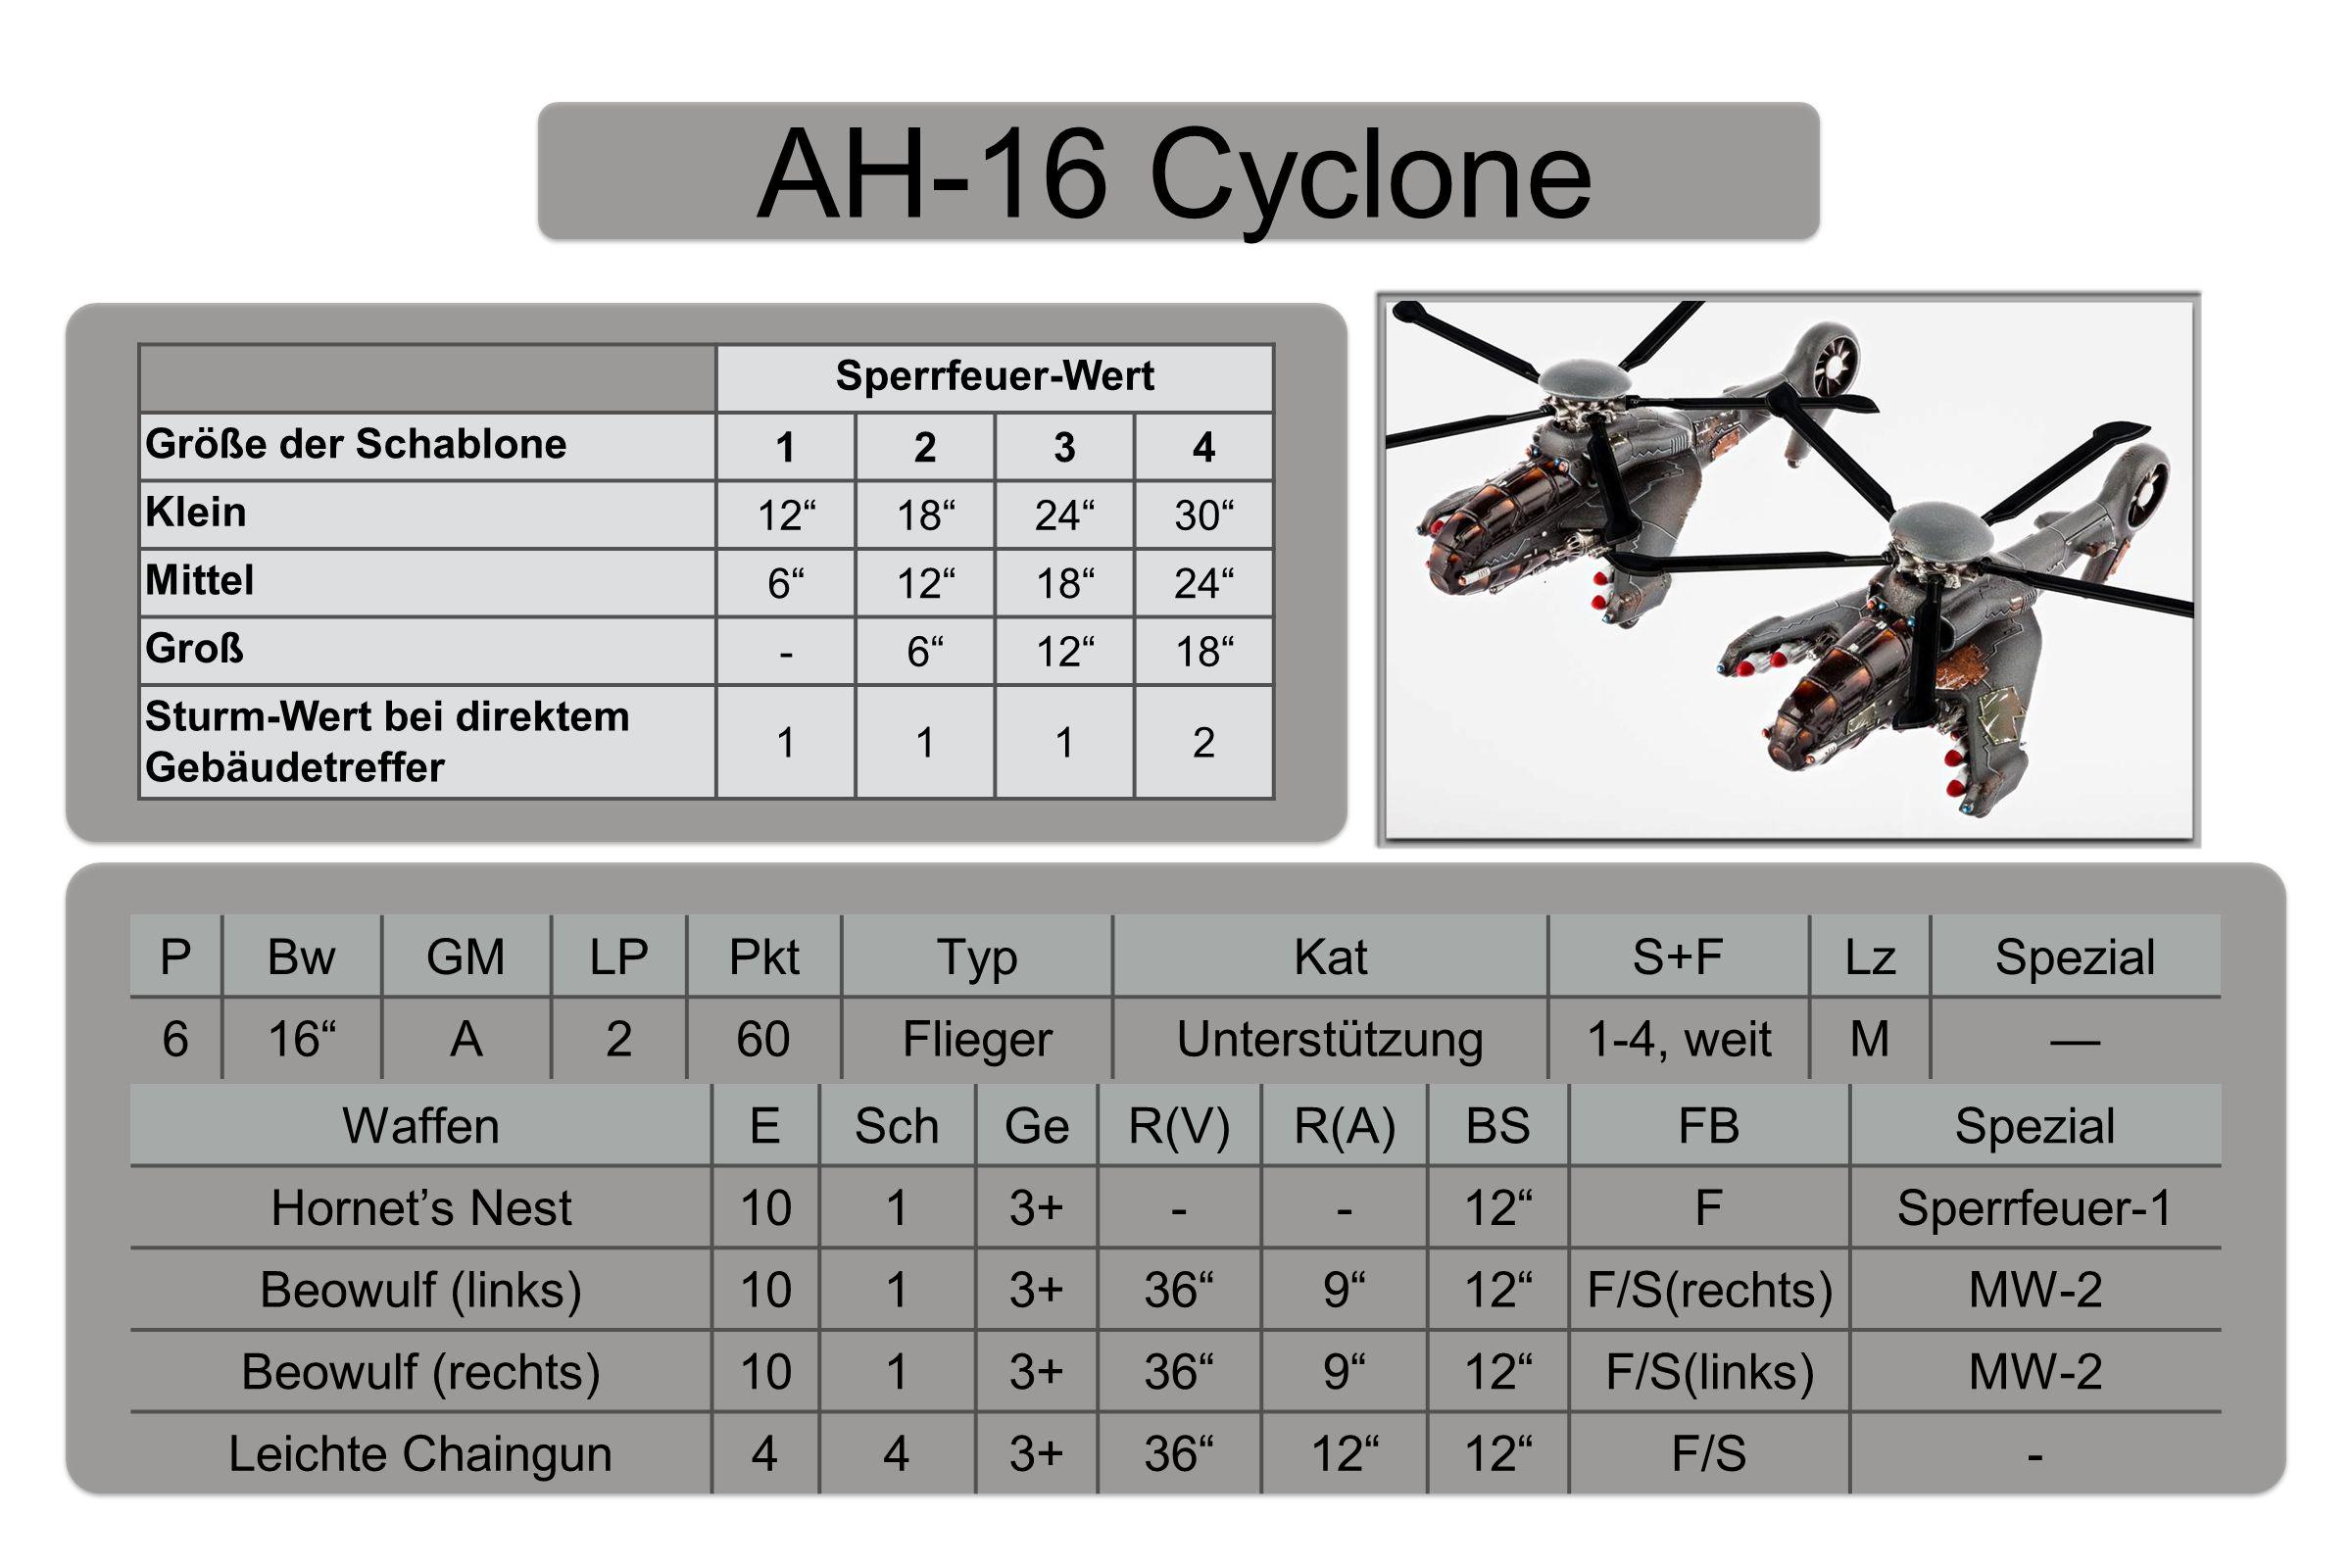 AH-16 Cyclone PBwGMLPPktTypKatS+FLzSpezial 616 A260FliegerUnterstützung1-4, weitM— WaffenESchGeR(V)R(A)BSFBSpezial Hornet's Nest1013+--12 FSperrfeuer-1 Beowulf (links)1013+36 9 12 F/S(rechts)MW-2 Beowulf (rechts)1013+36 9 12 F/S(links)MW-2 Leichte Chaingun443+36 12 F/S- Sperrfeuer-Wert Größe der Schablone 1234 Klein 12 18 24 30 Mittel 6 12 18 24 Groß -6 12 18 Sturm-Wert bei direktem Gebäudetreffer 1112